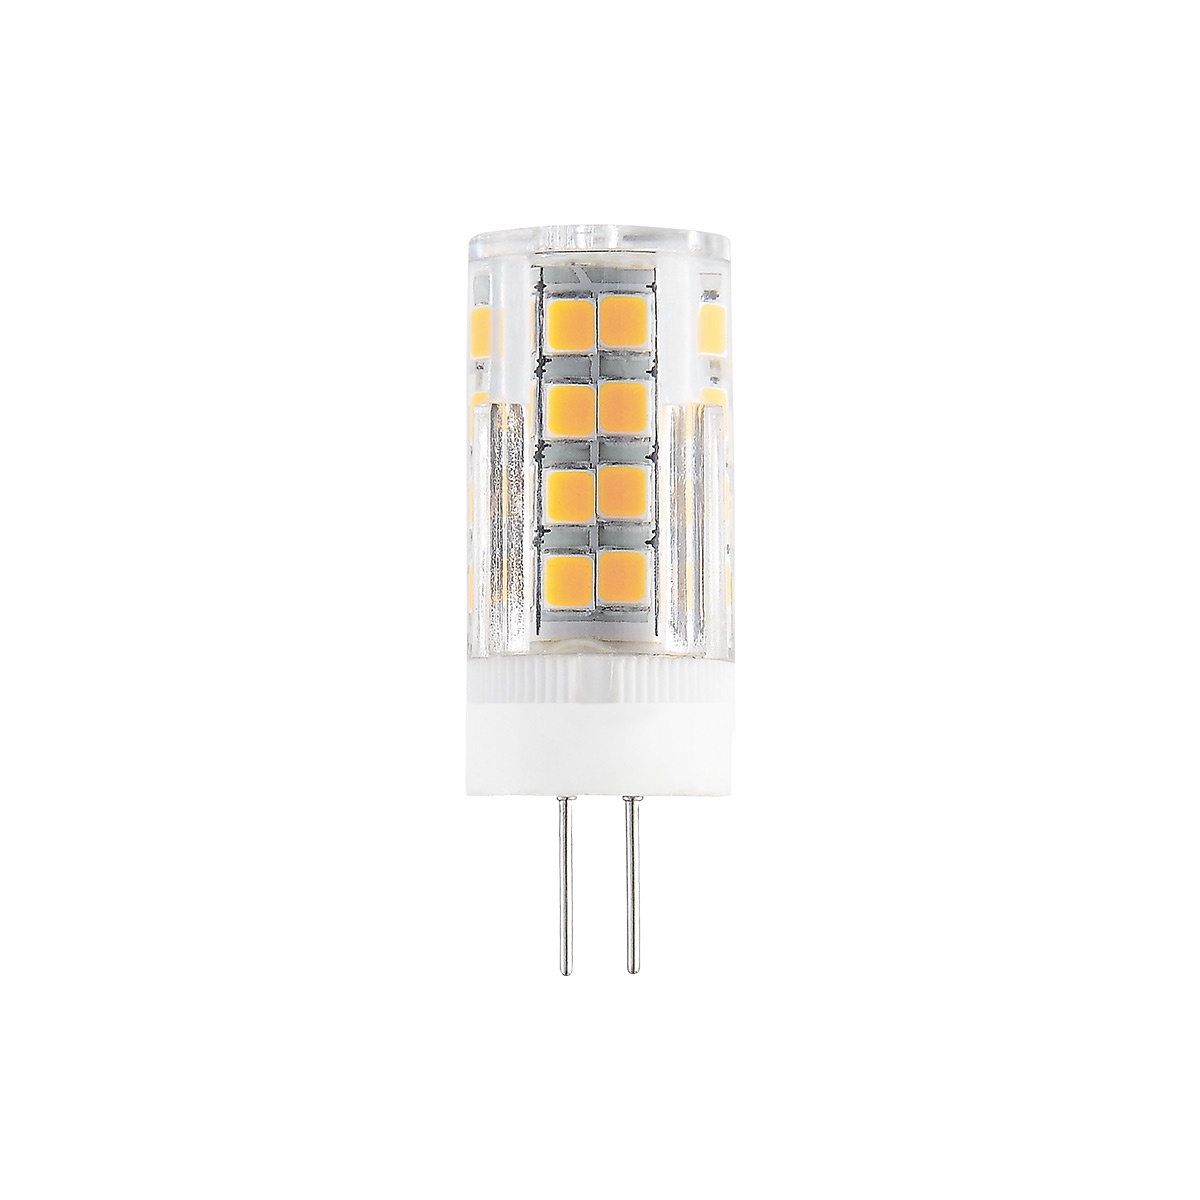 Лампочка Elektrostandard светодиодная G4 LED BL107 7W 220V 3300K, Теплый свет 7 Вт, Светодиодная светодиодная лампа kosmos теплый свет цоколь e27 7w 220v lksm led7wr63e2730